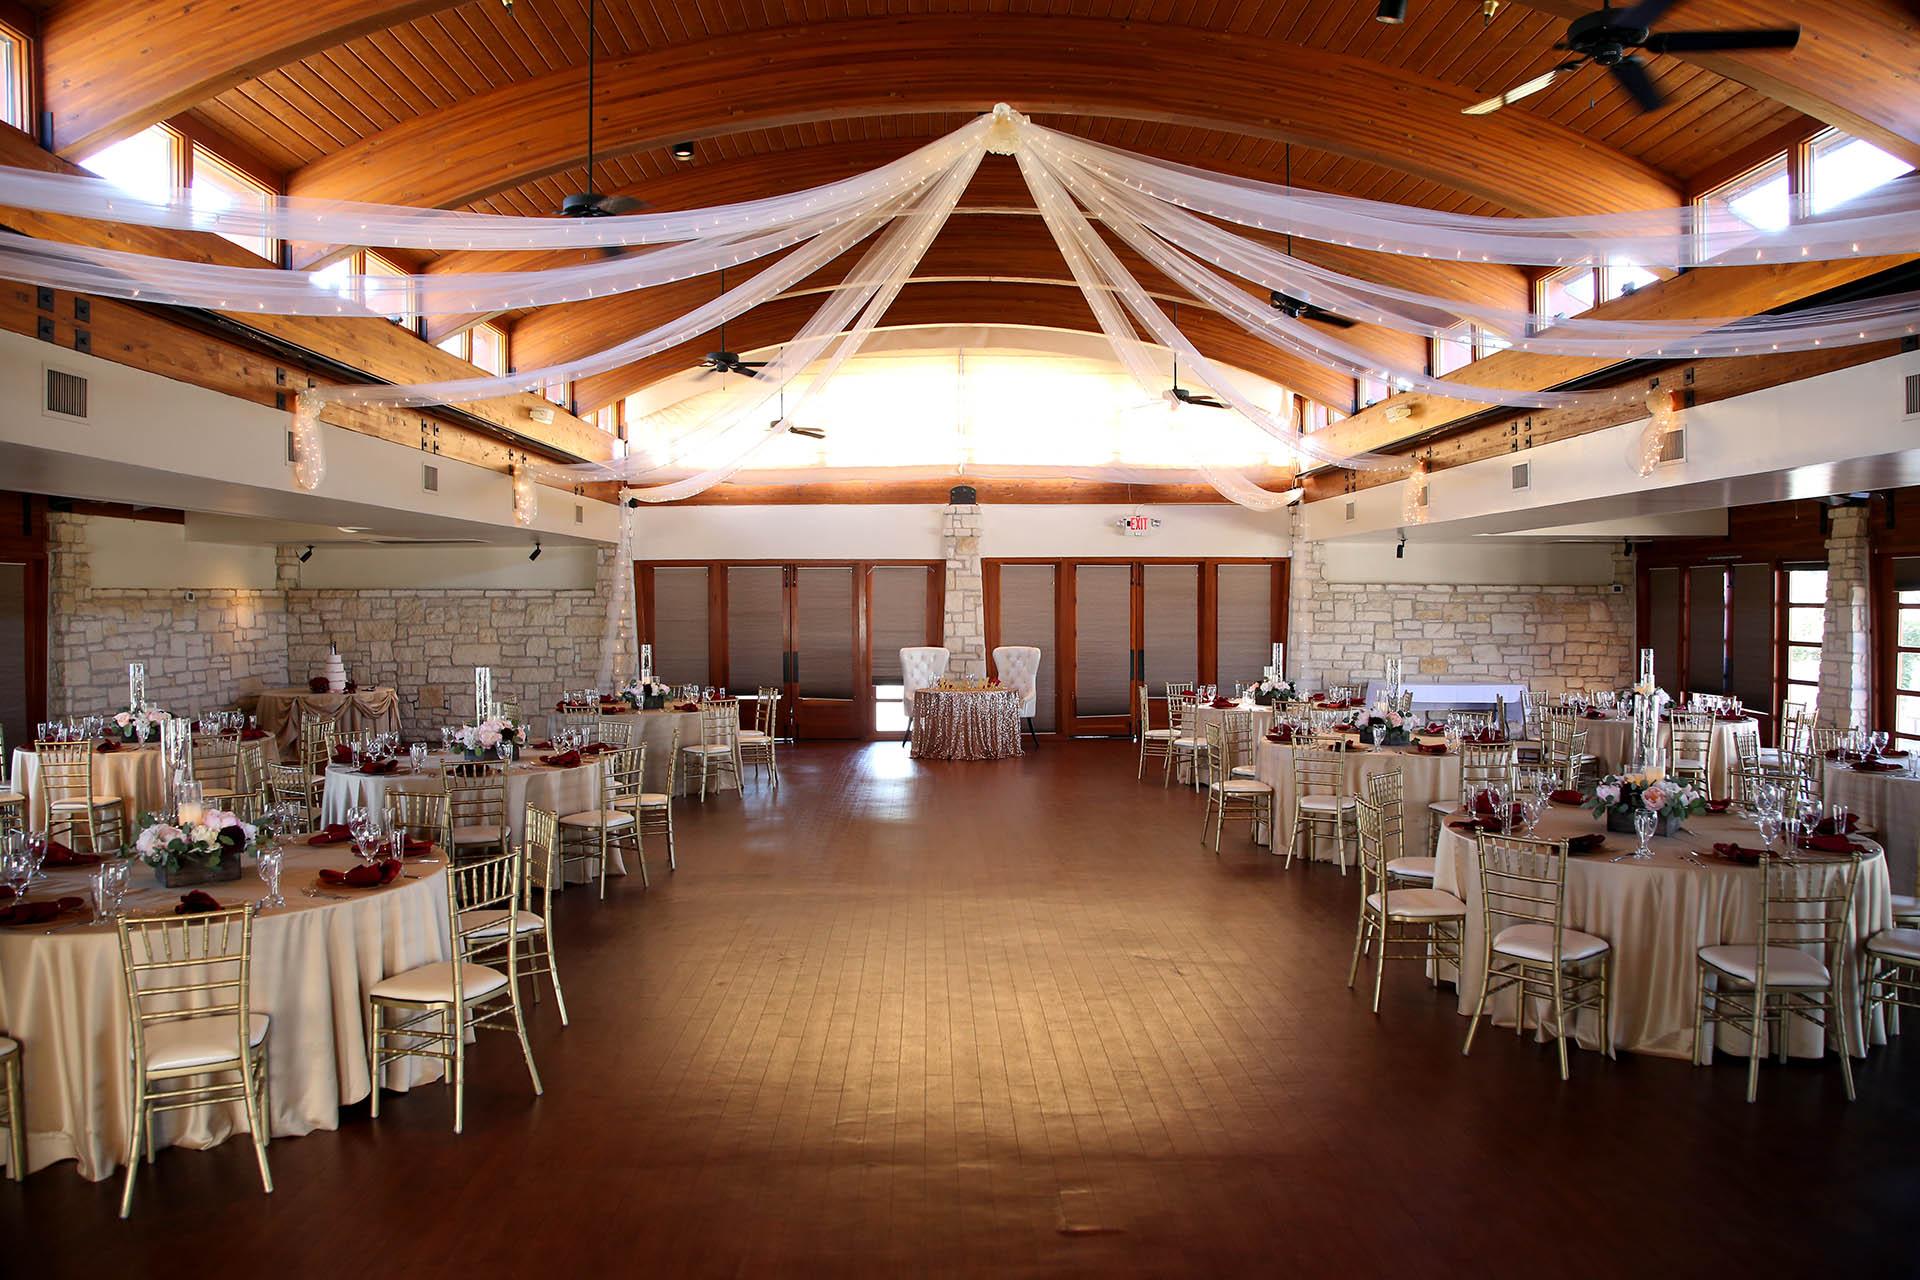 Wedgewood weddings ocotillo wedgewood weddings for Affordable wedding venues in az